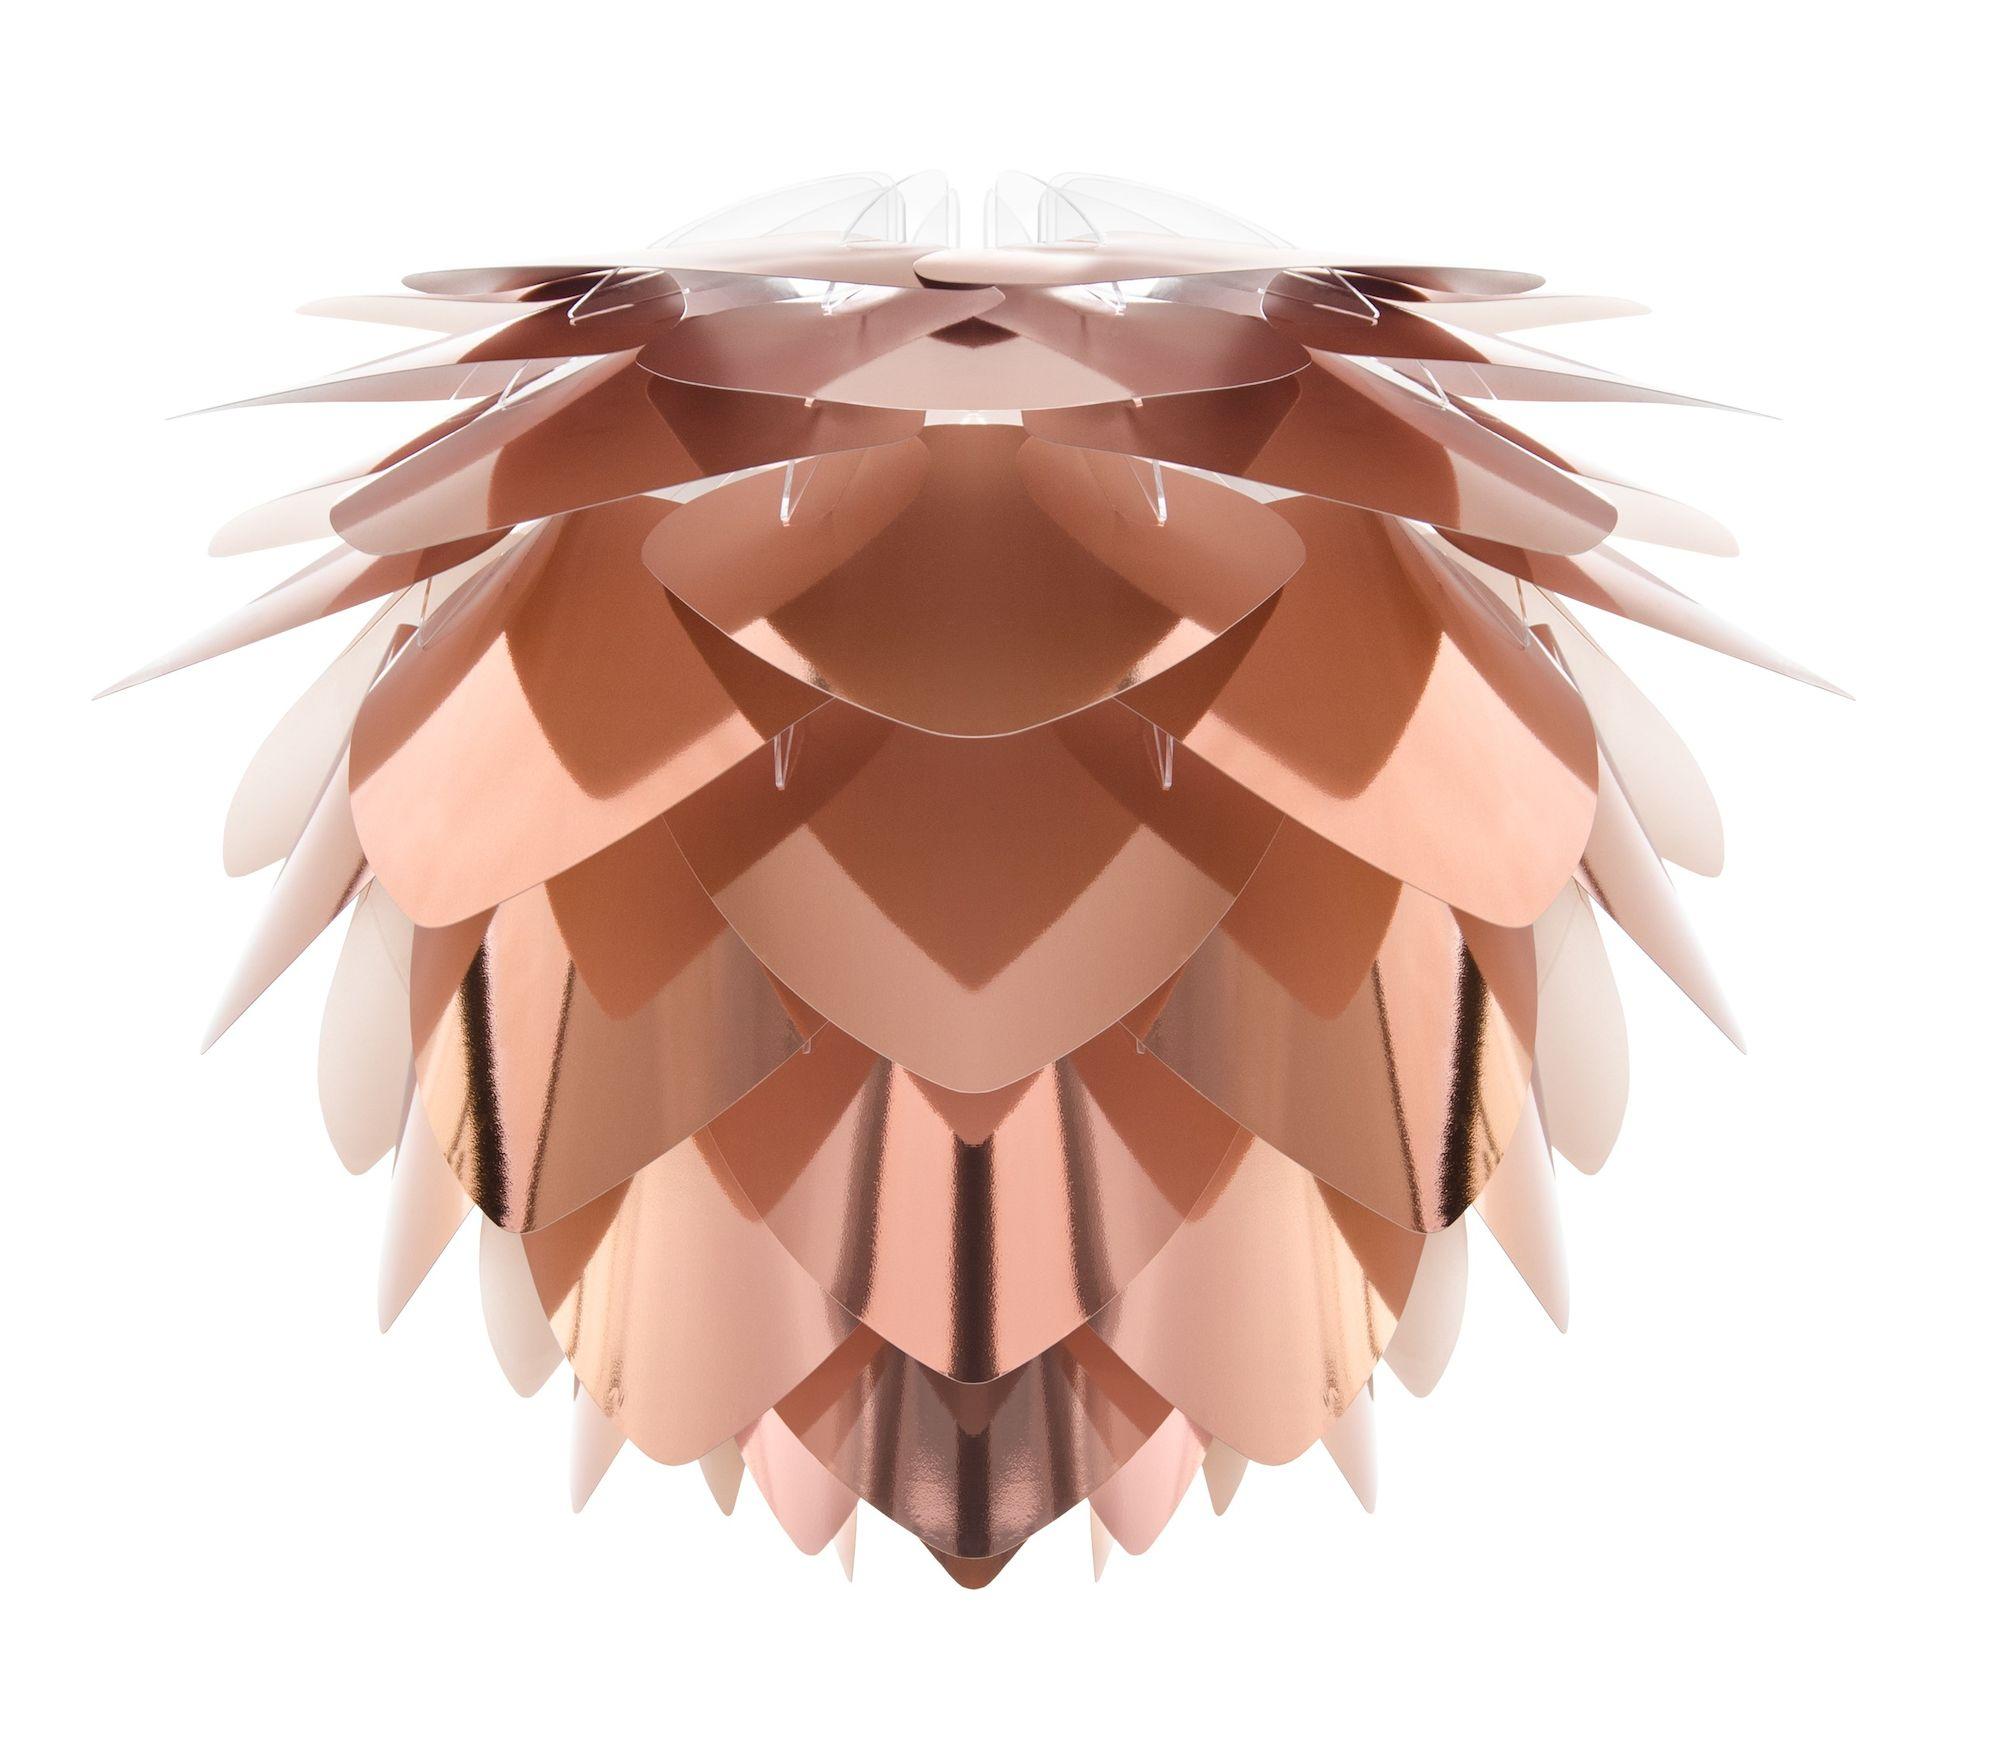 Umage Silvia Lampunvarjostin Mini, Copper